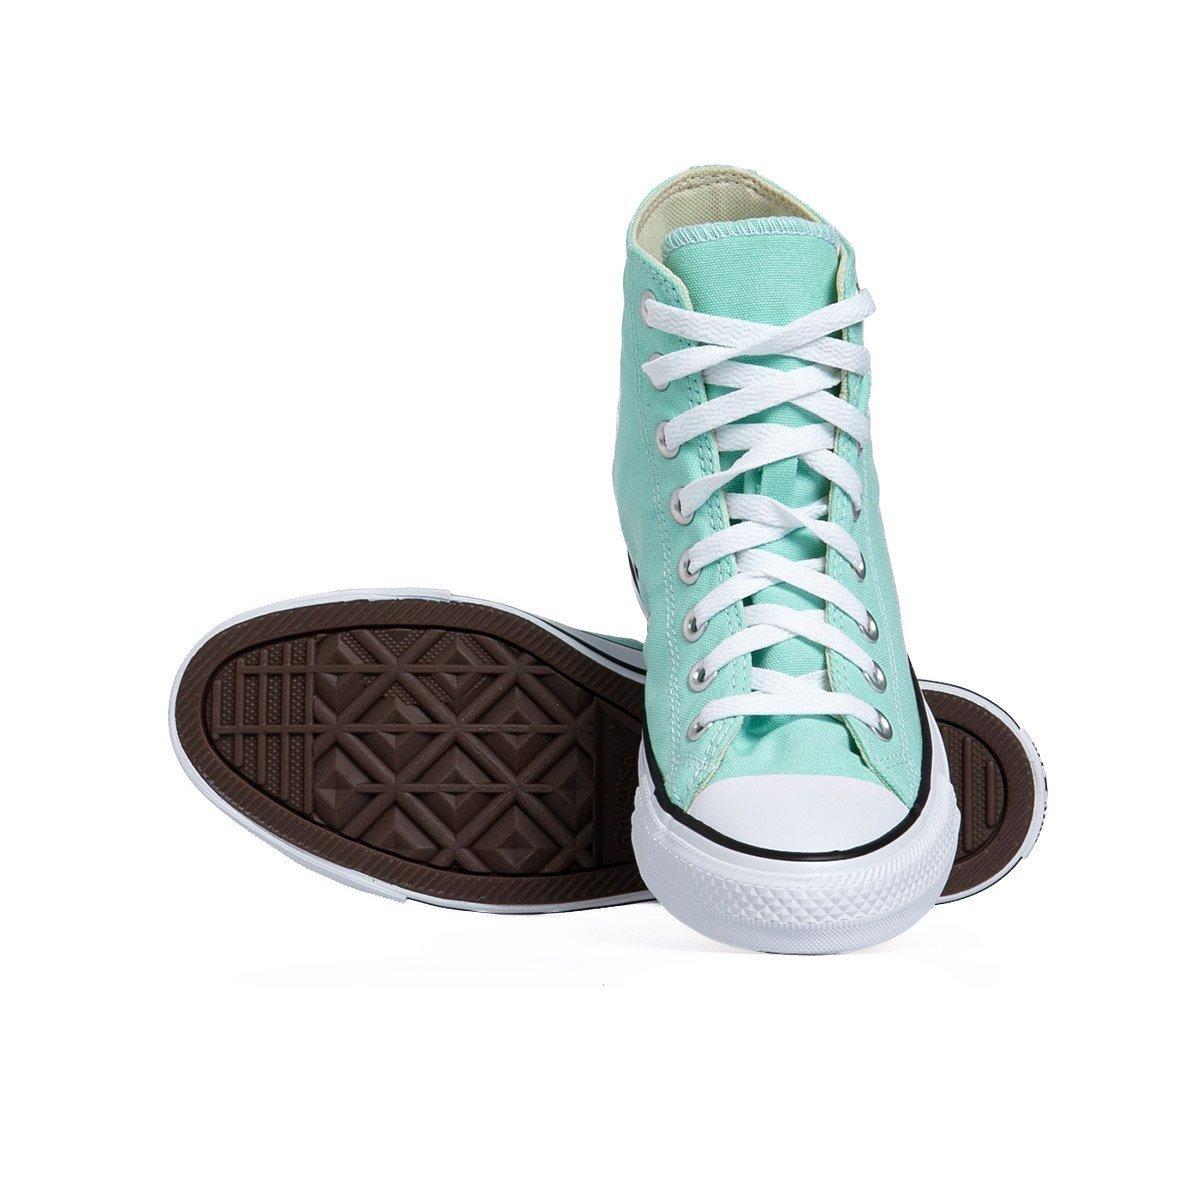 Sneakers buty damskie Converse Chuck Taylor All Star niebieskie (166707C)